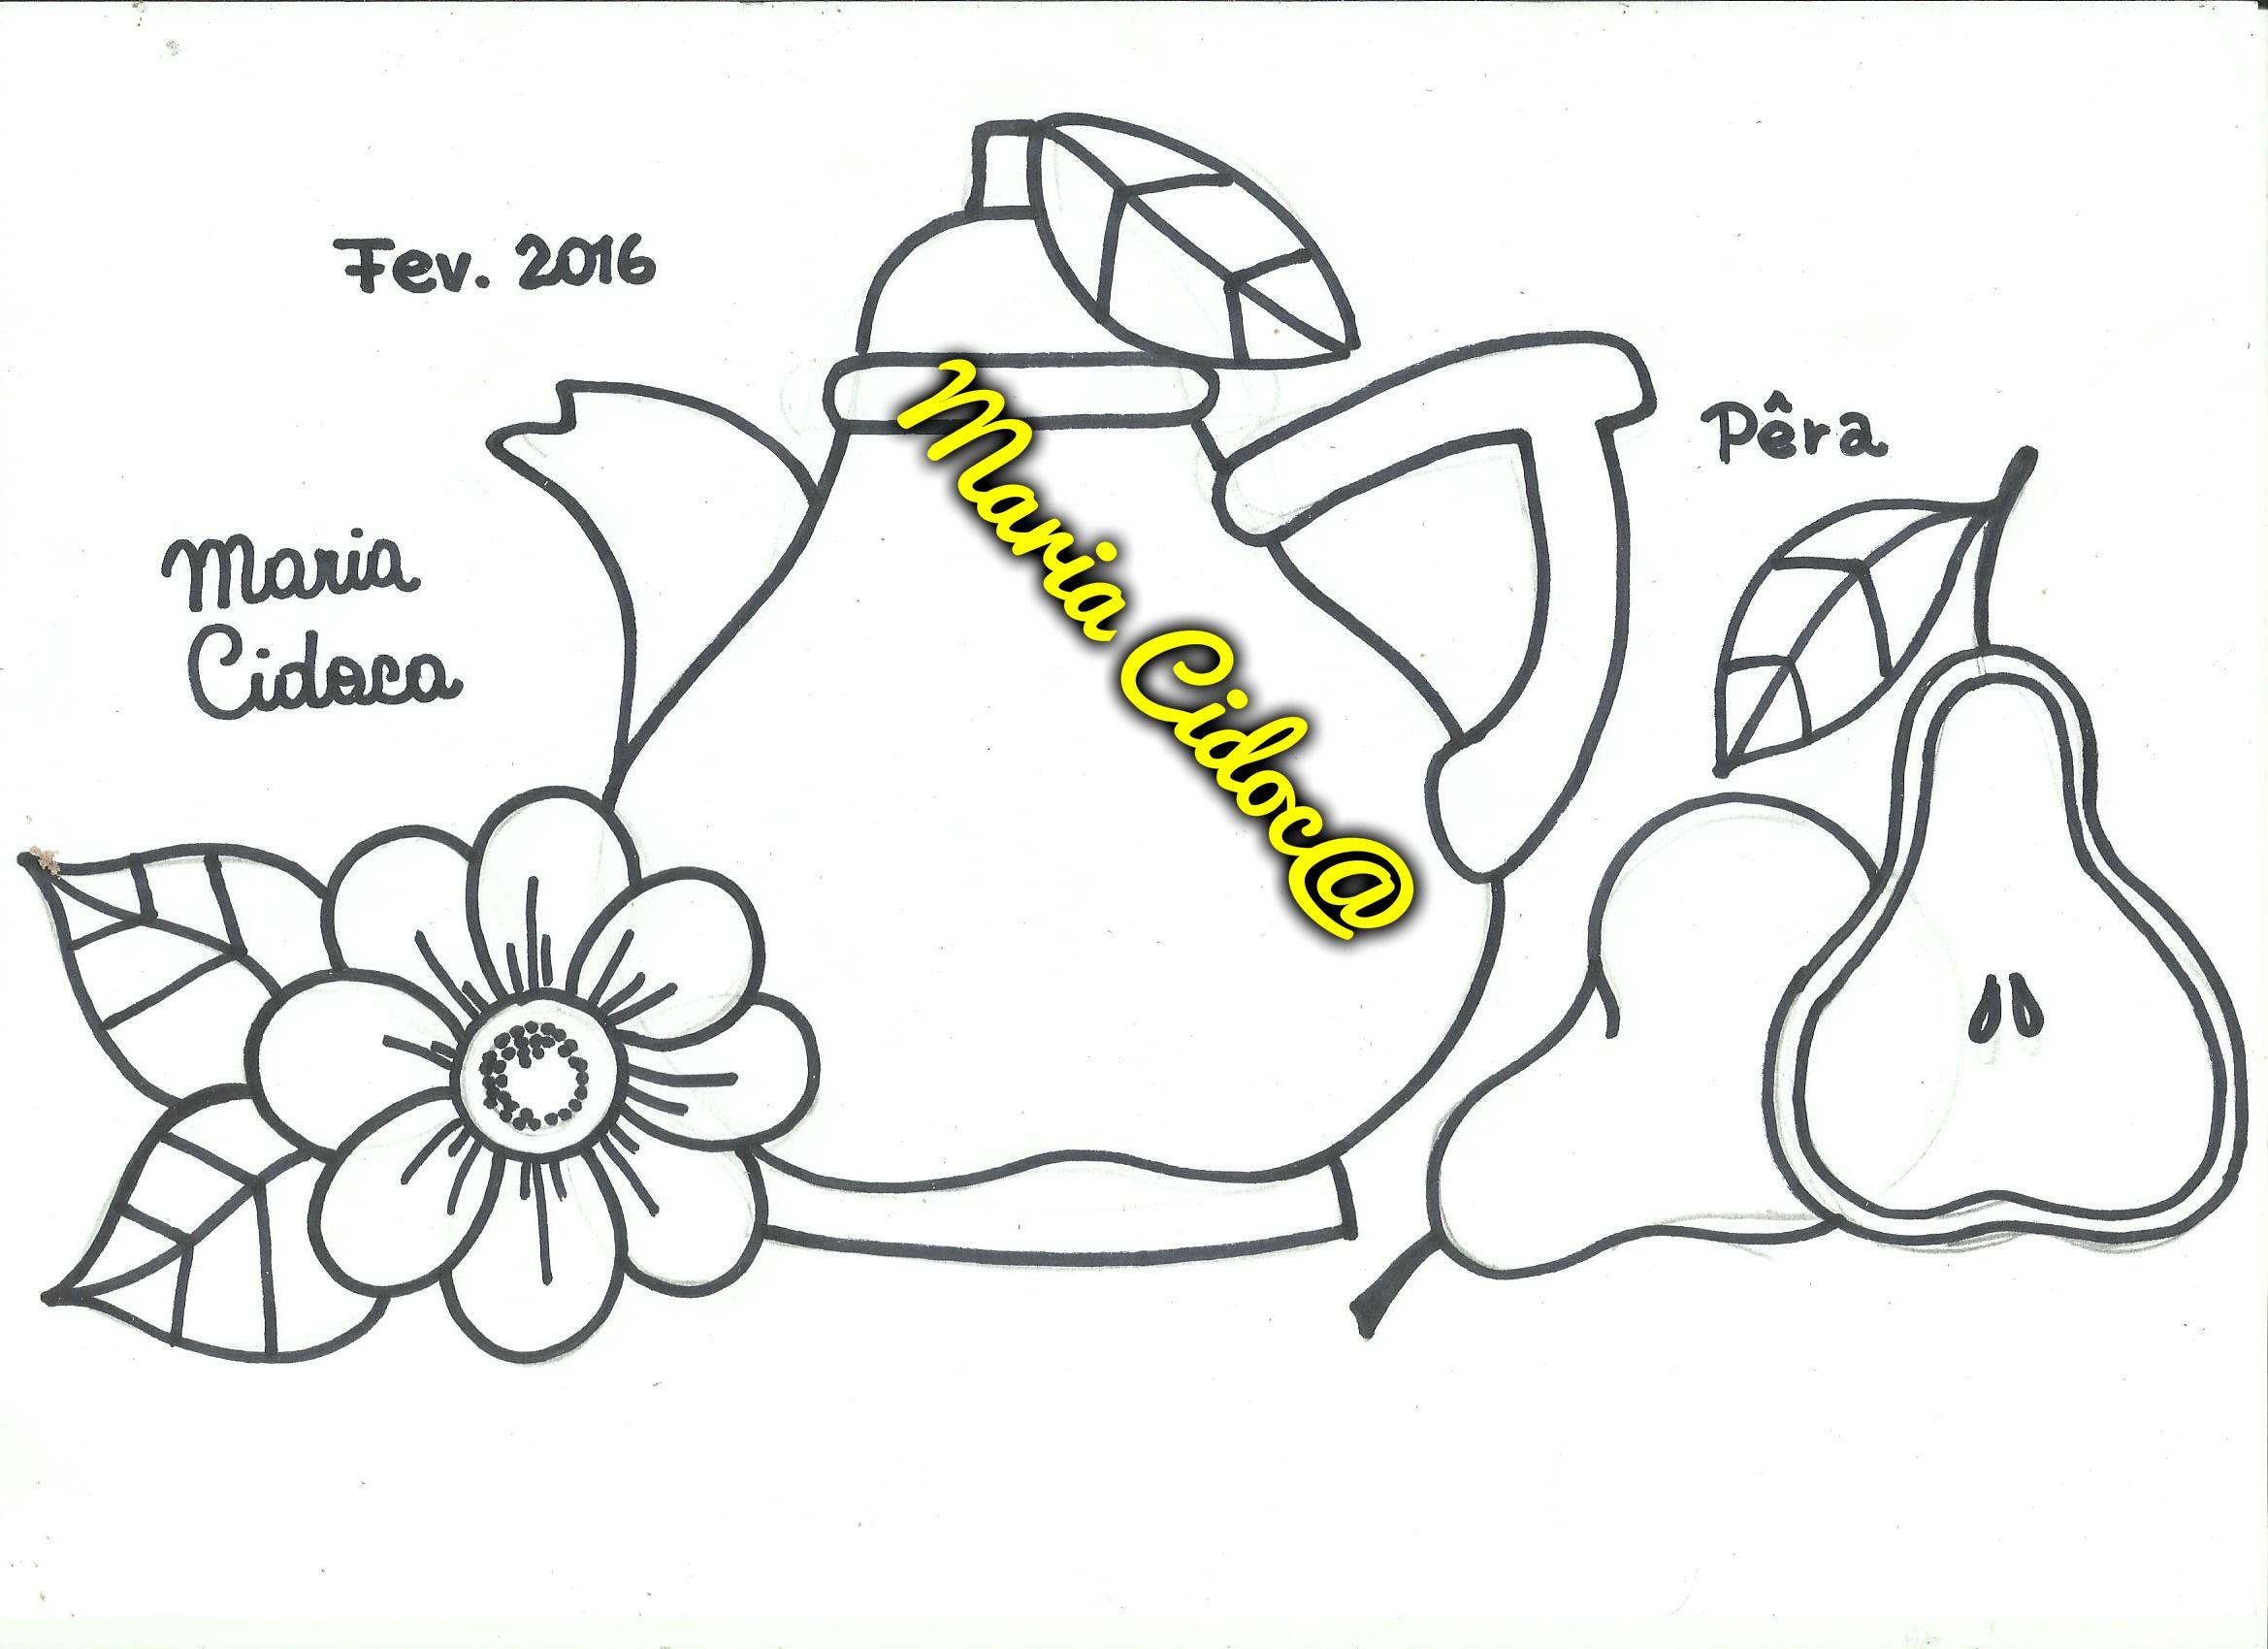 Bule Pera Tetera Pera Pear Tea Pot Disenos De Fruta Dibujos De Frutas Pintar En Tela